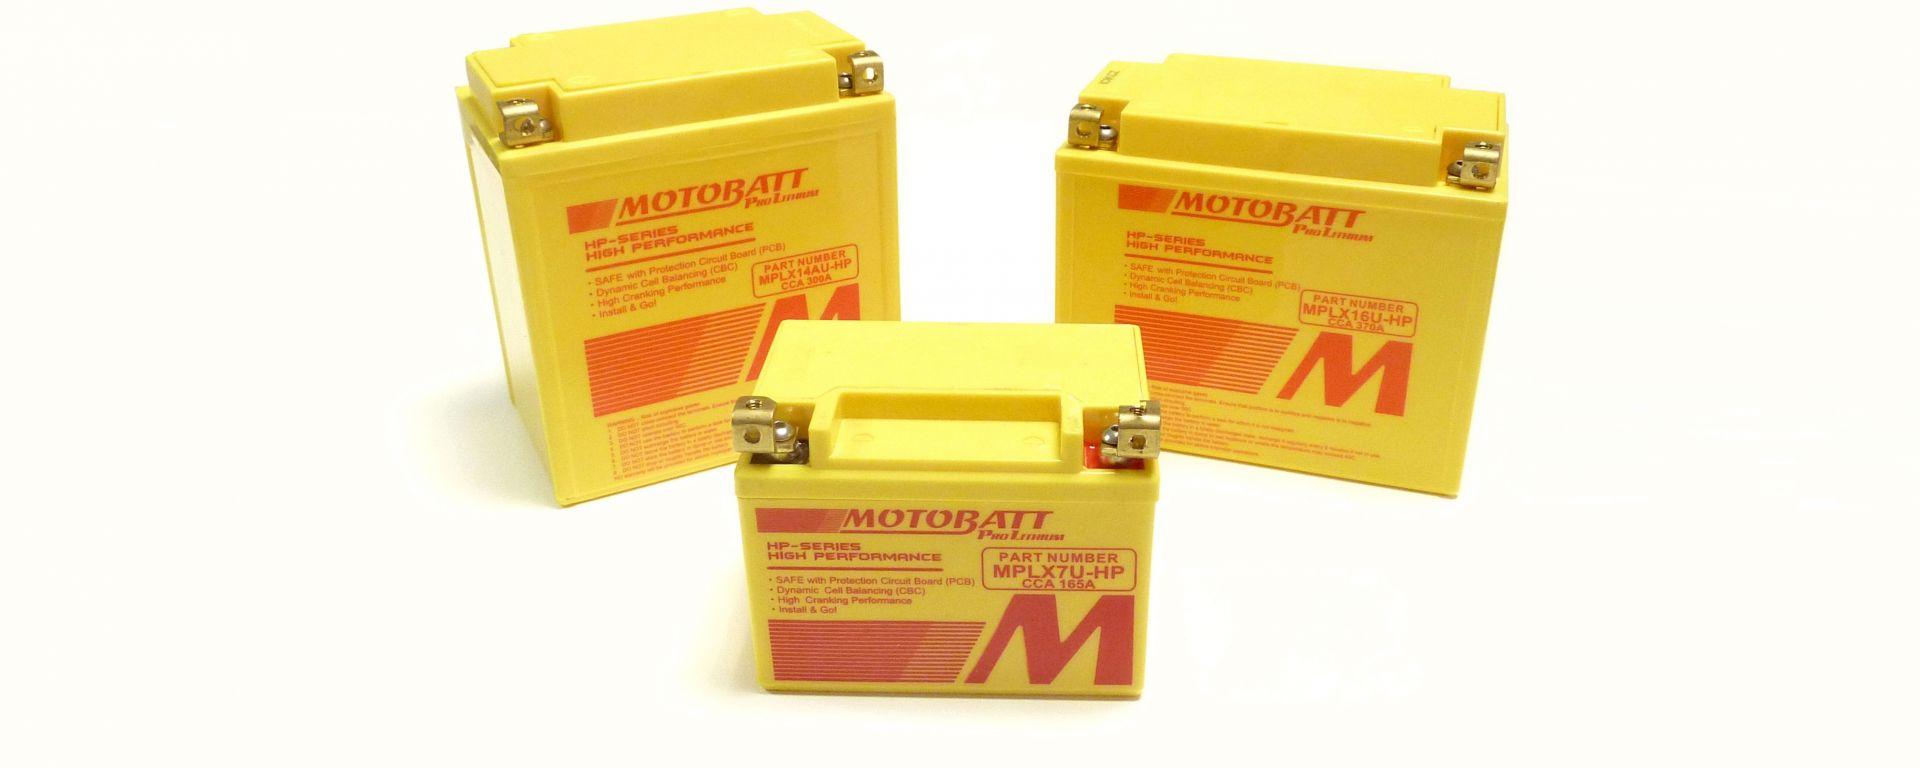 Motobatt Pro Lithium HP sono  importate e distribuite da Bergamaschi